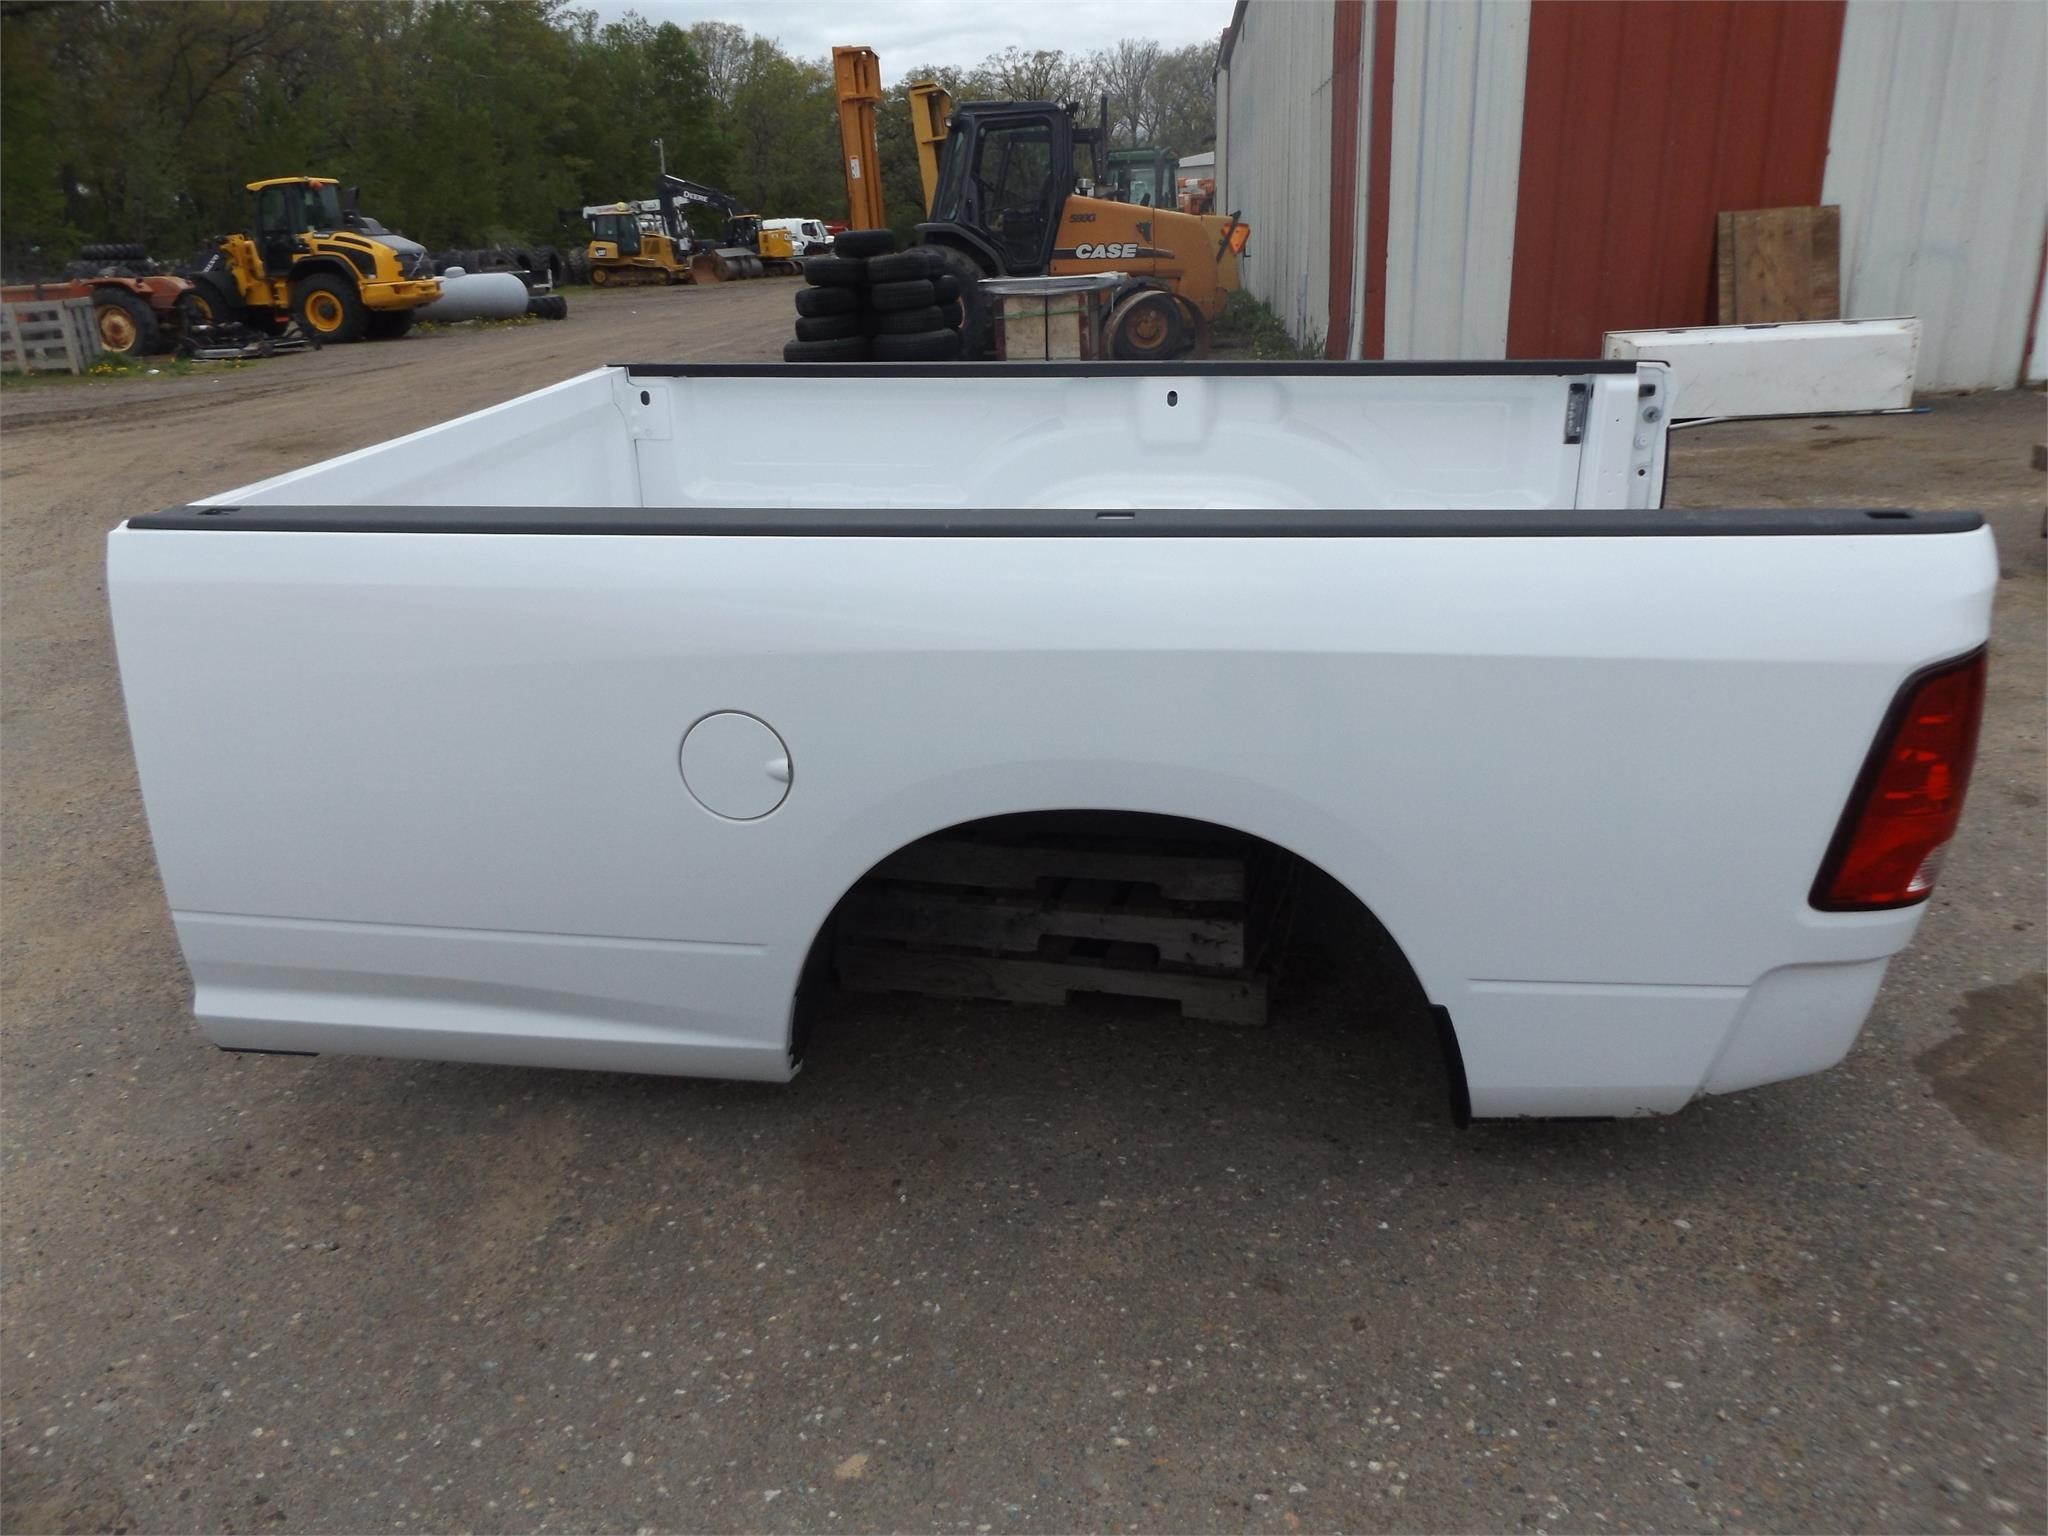 2018 Dodge 8 ft Truck Bed